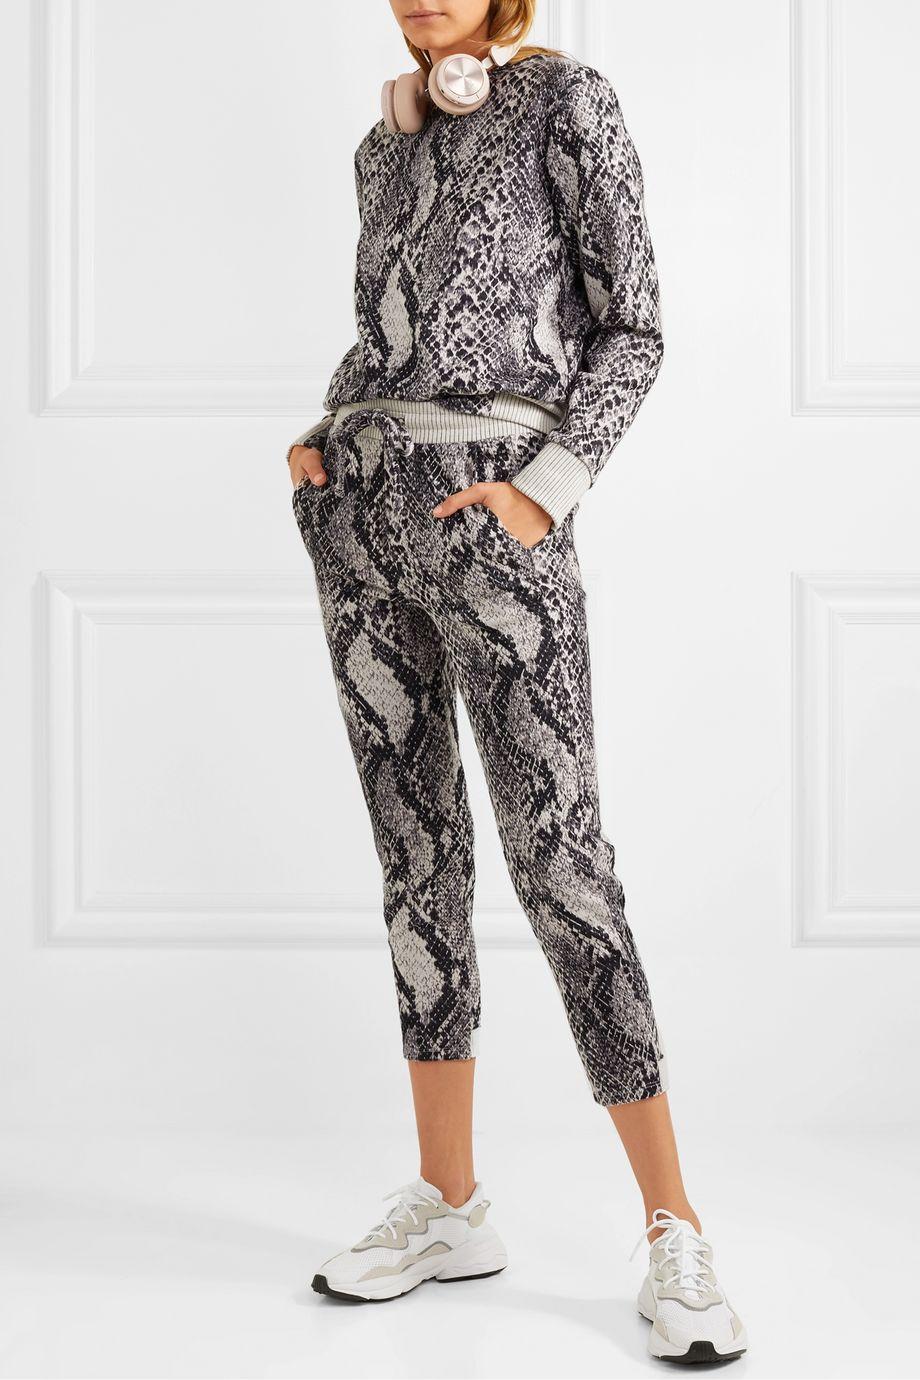 TWENTY Montréal Strike cropped cotton-blend snake-jacquard track pants